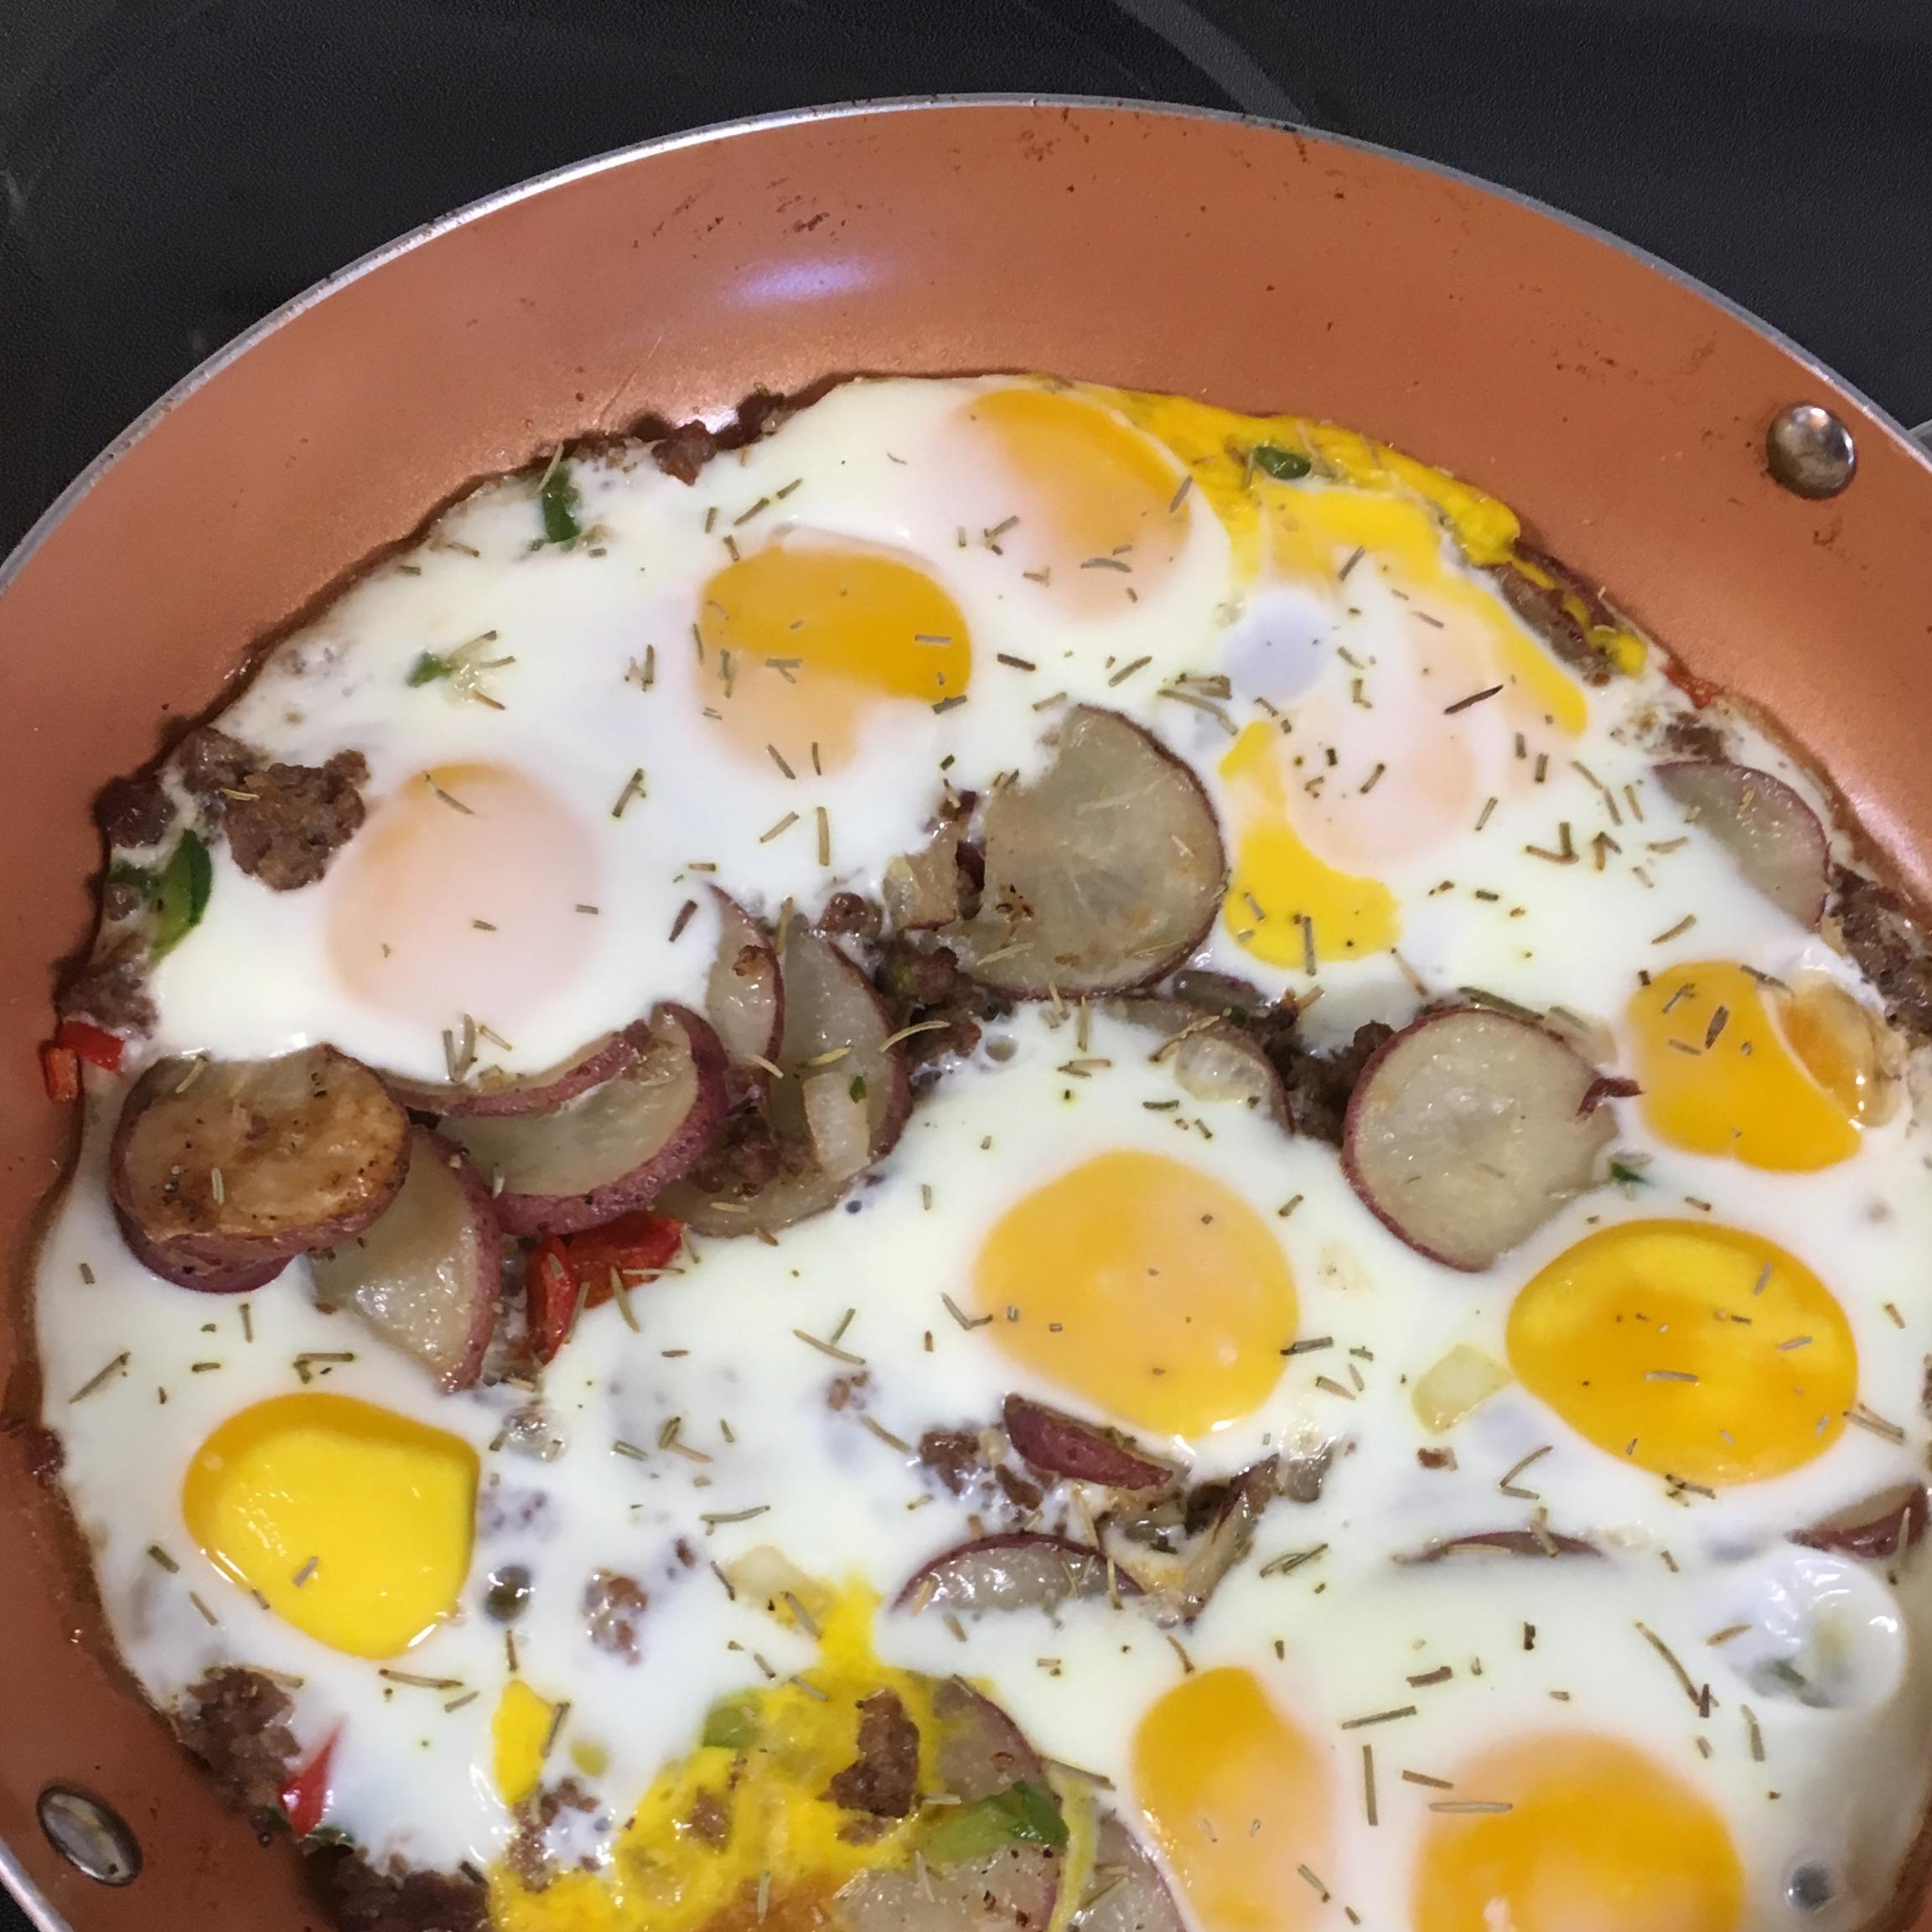 Cowboy Skillet: New Potato Medley, Italian Sausage & Eggs Kara